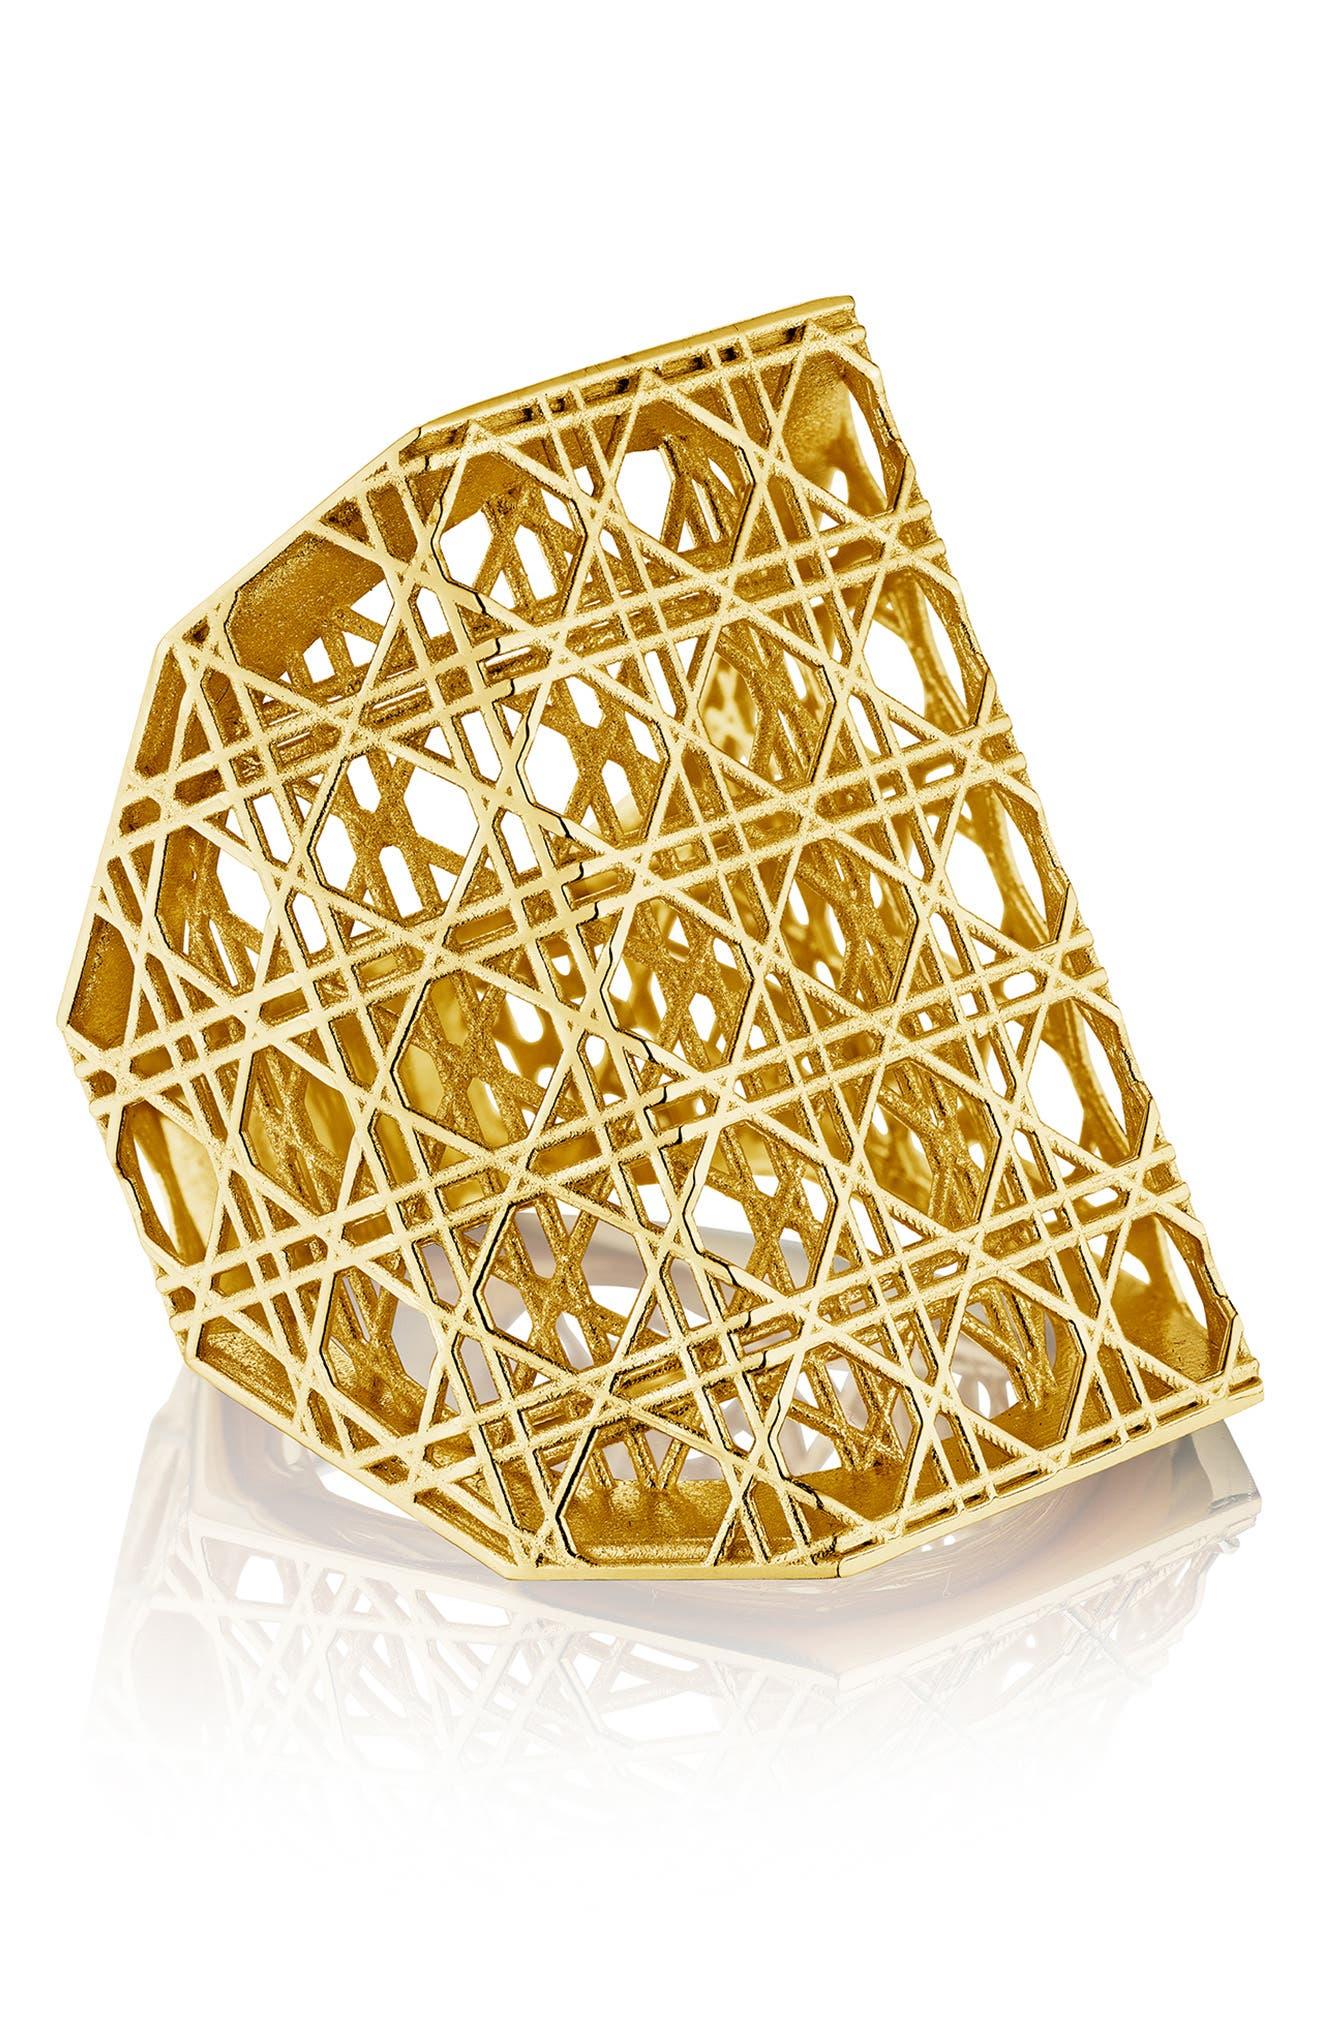 Cane Maxi Ring